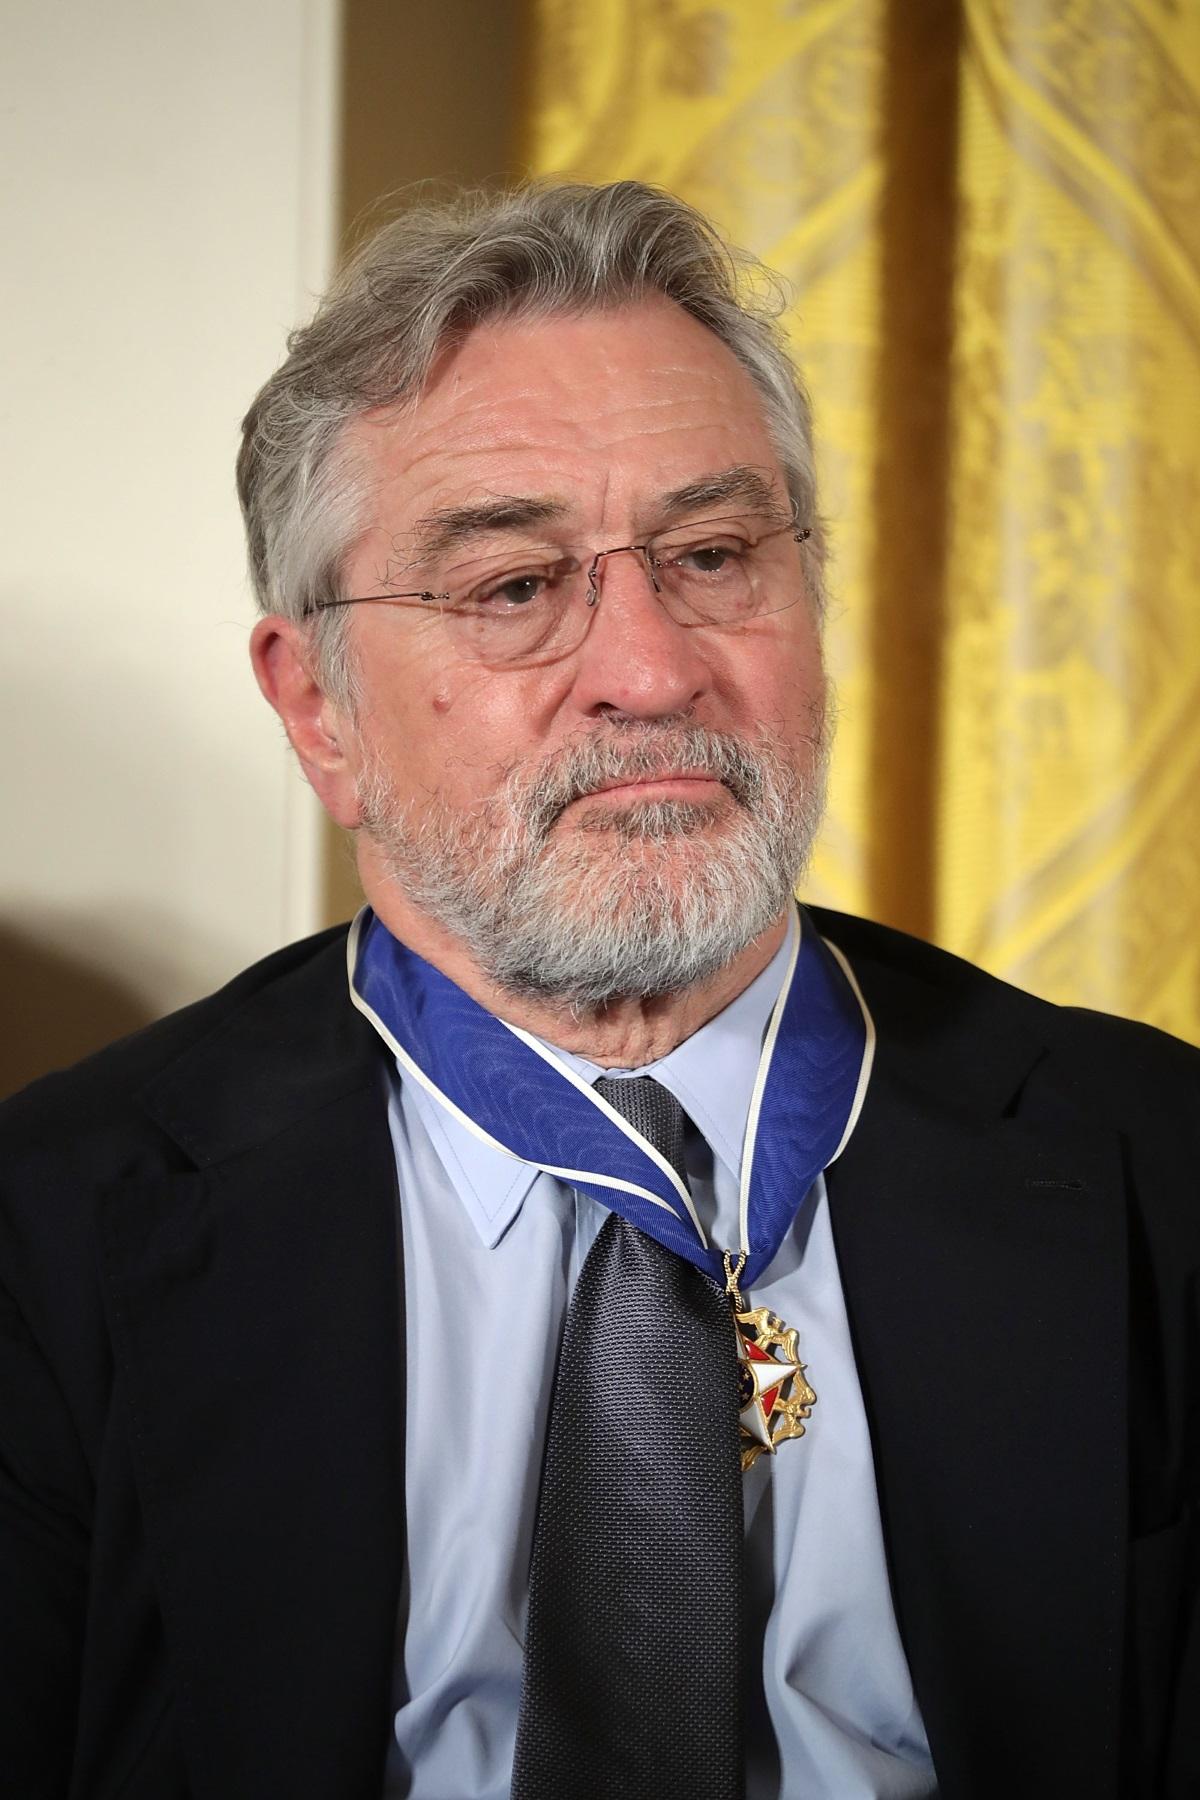 Барак Обама връчи Медал на свободата на Робърт де Ниро